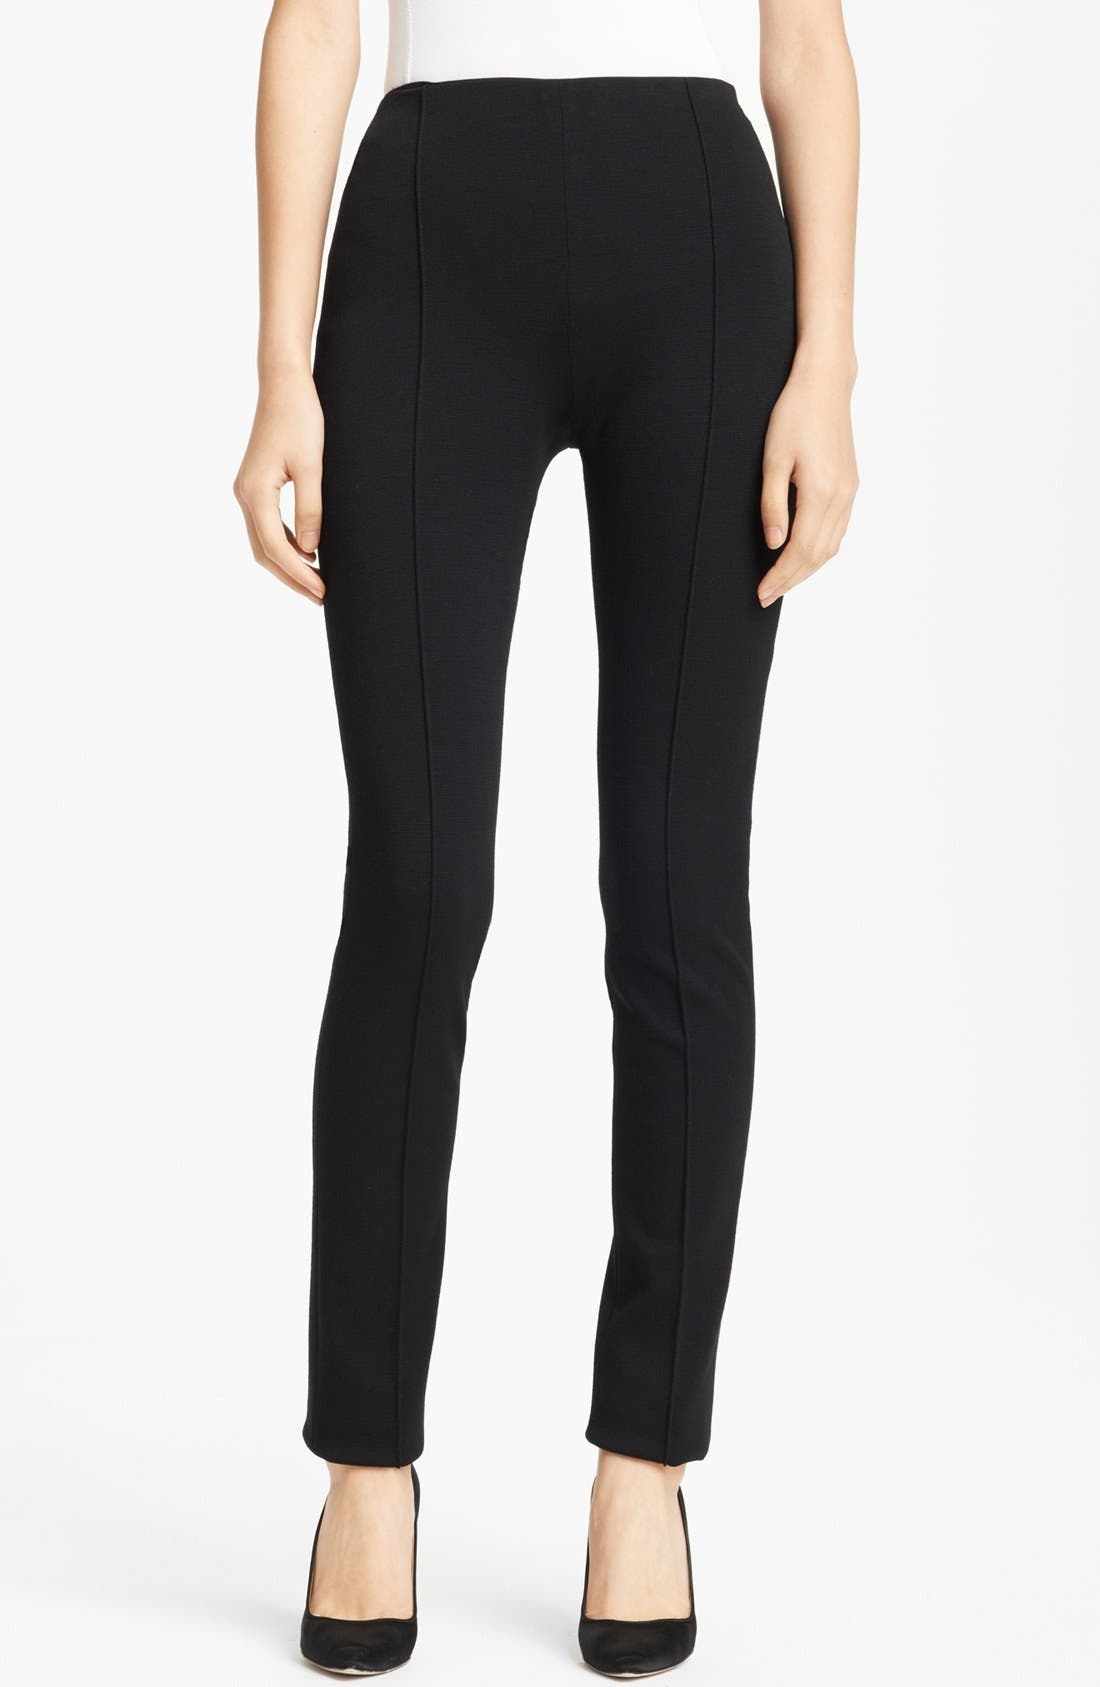 Alternate Image 1 Selected - Oscar de la Renta Skinny Stretch Jersey Pants